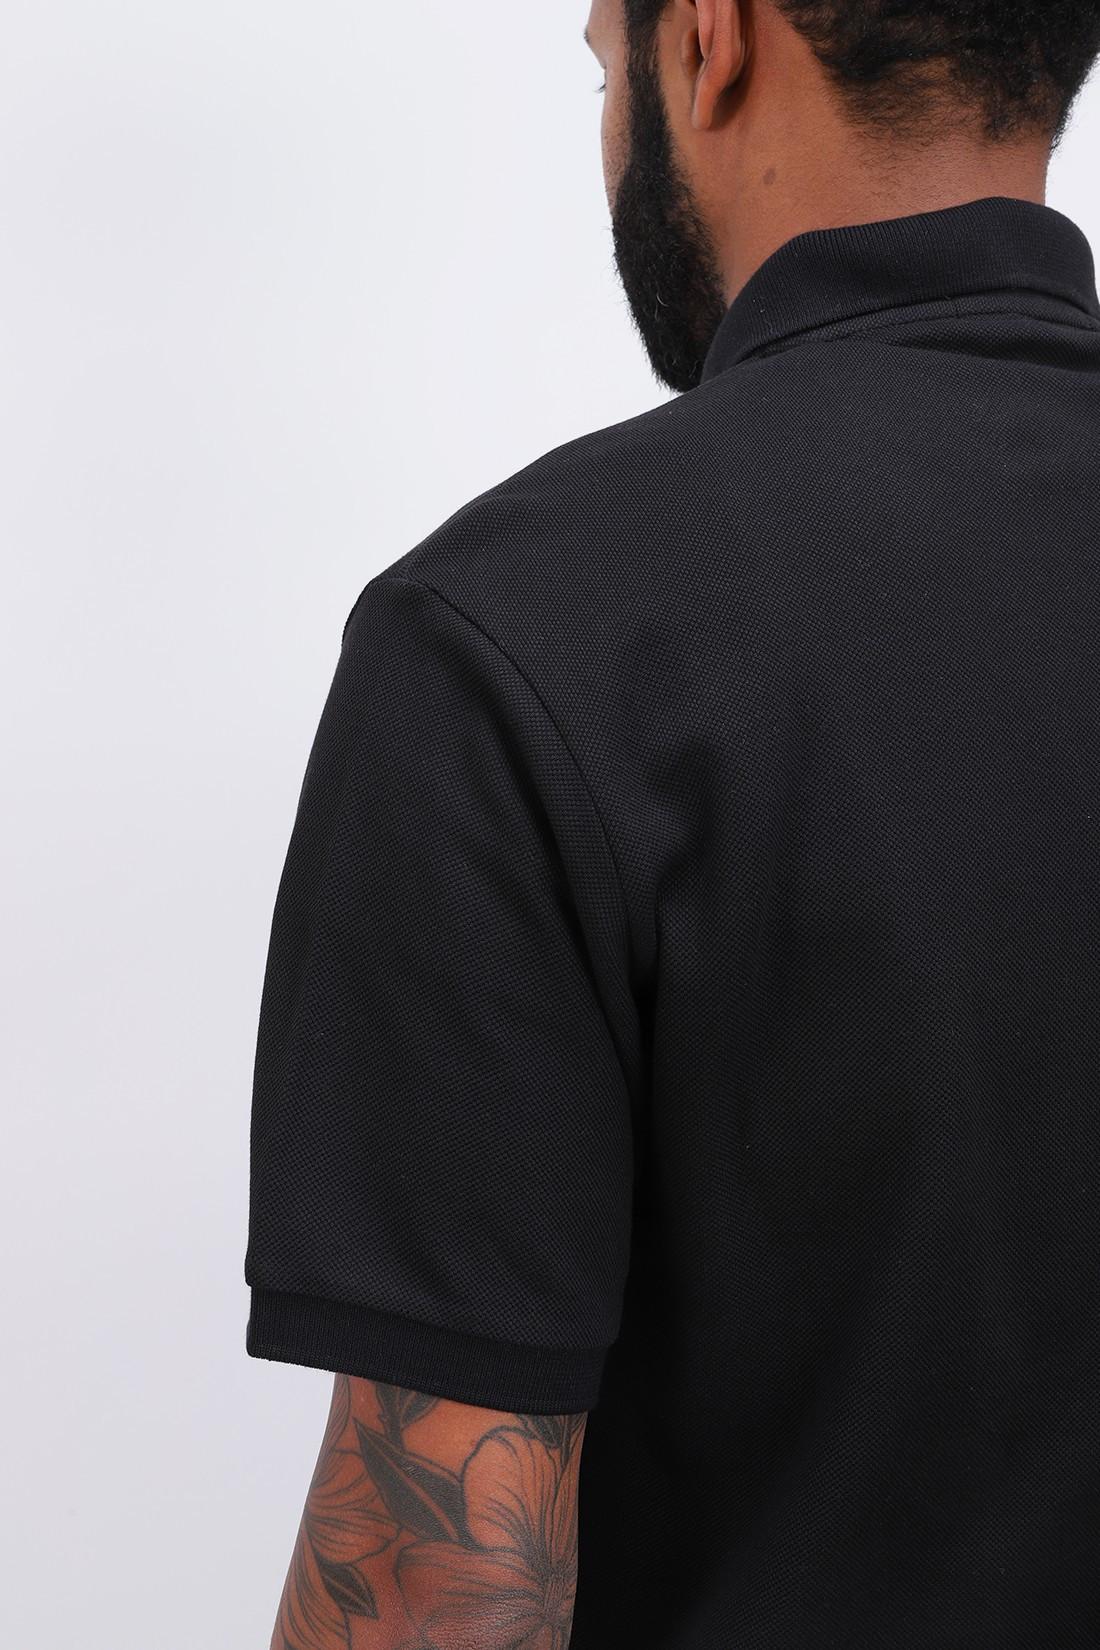 STONE ISLAND / 22r39 polo shirt v0029 Nero